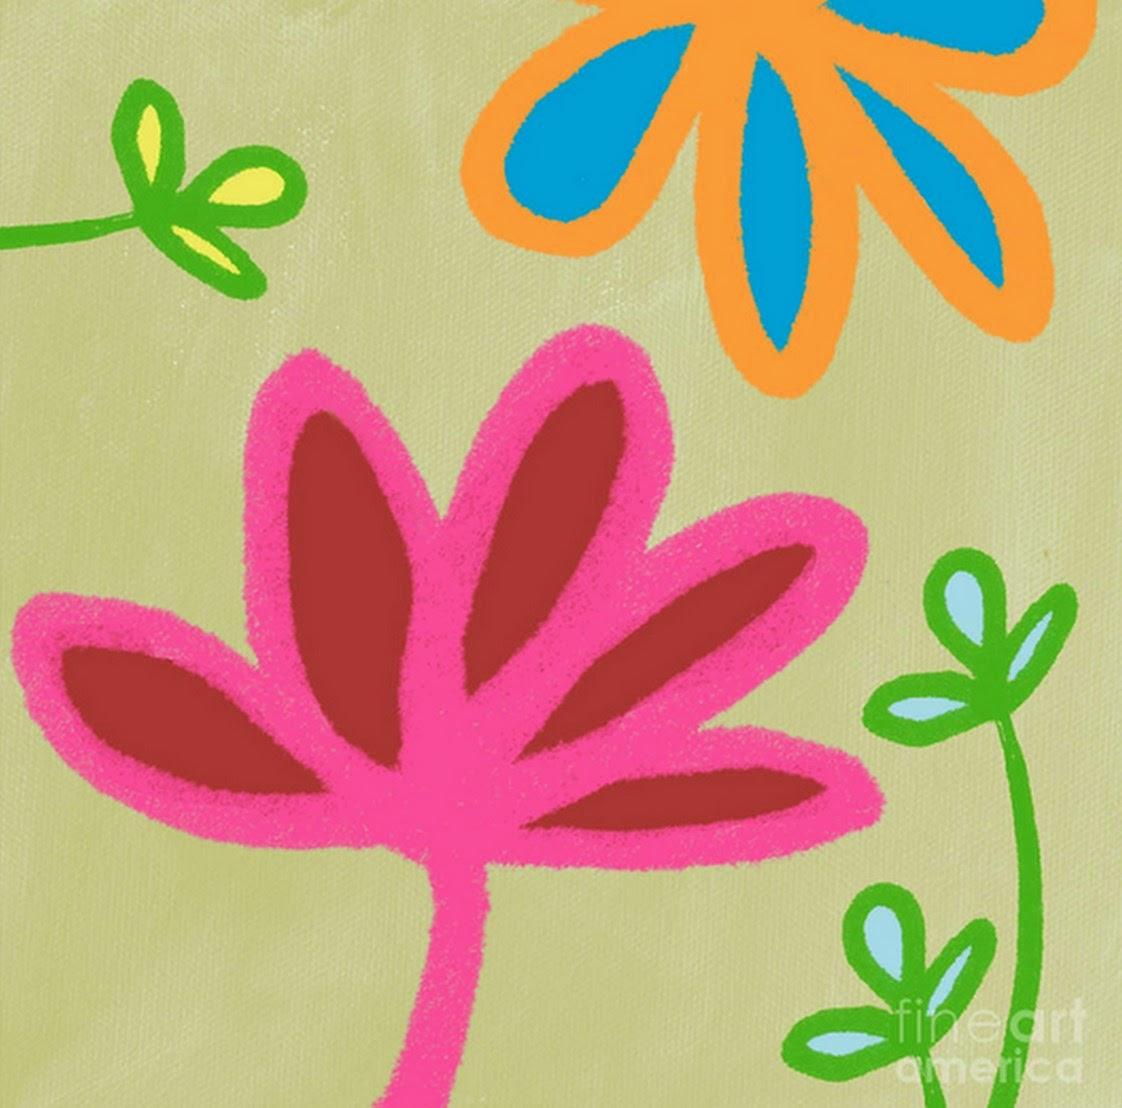 Pintura moderna y fotograf a art stica dise os de flores - Cuadros para principiantes ...